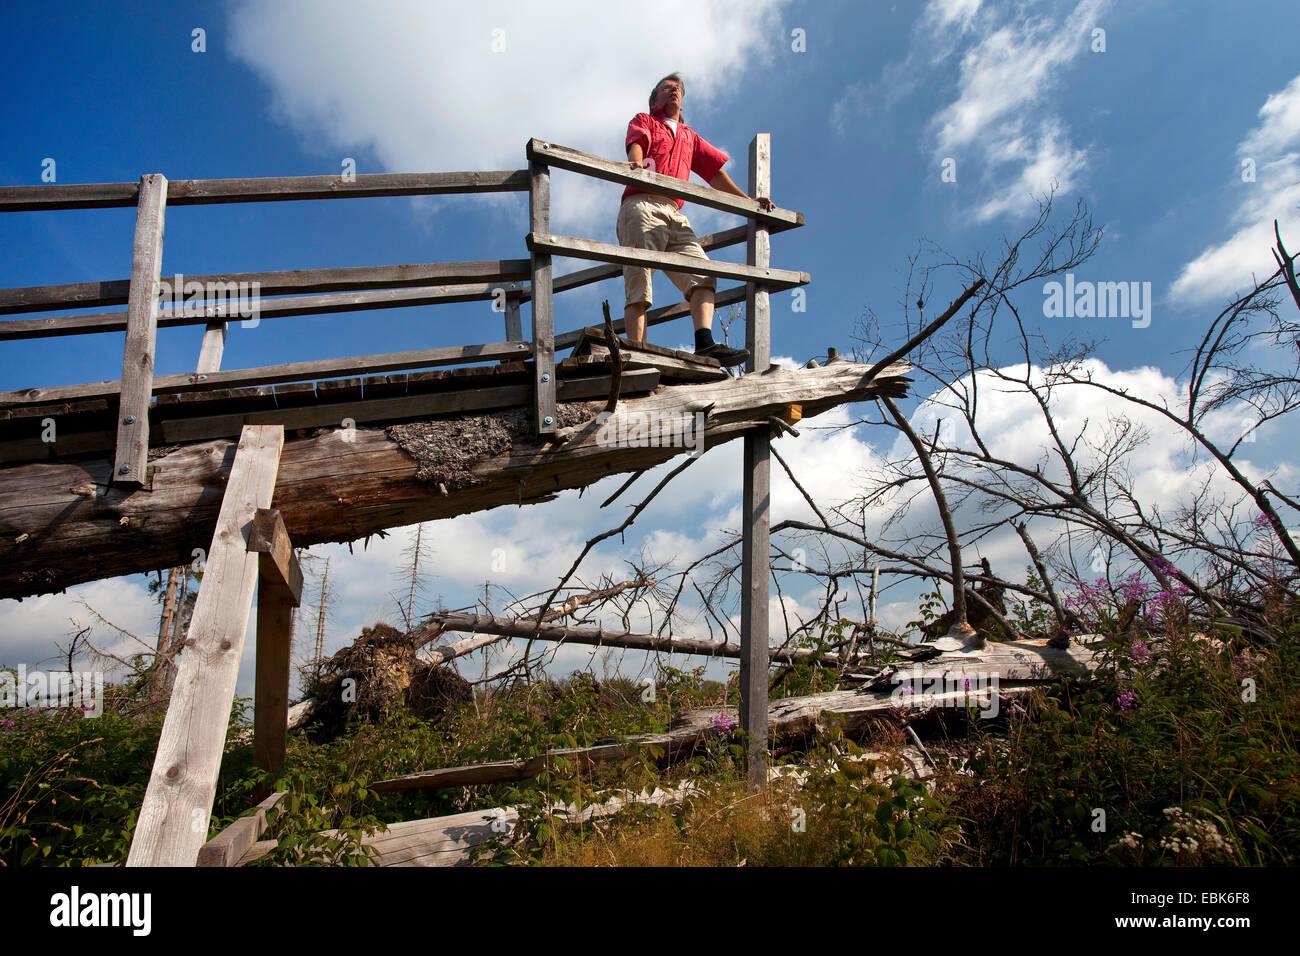 man on Kyrill path looking at storm losses, Germany, North Rhine-Westphalia, Sauerland, Schmallenberg - Stock Image